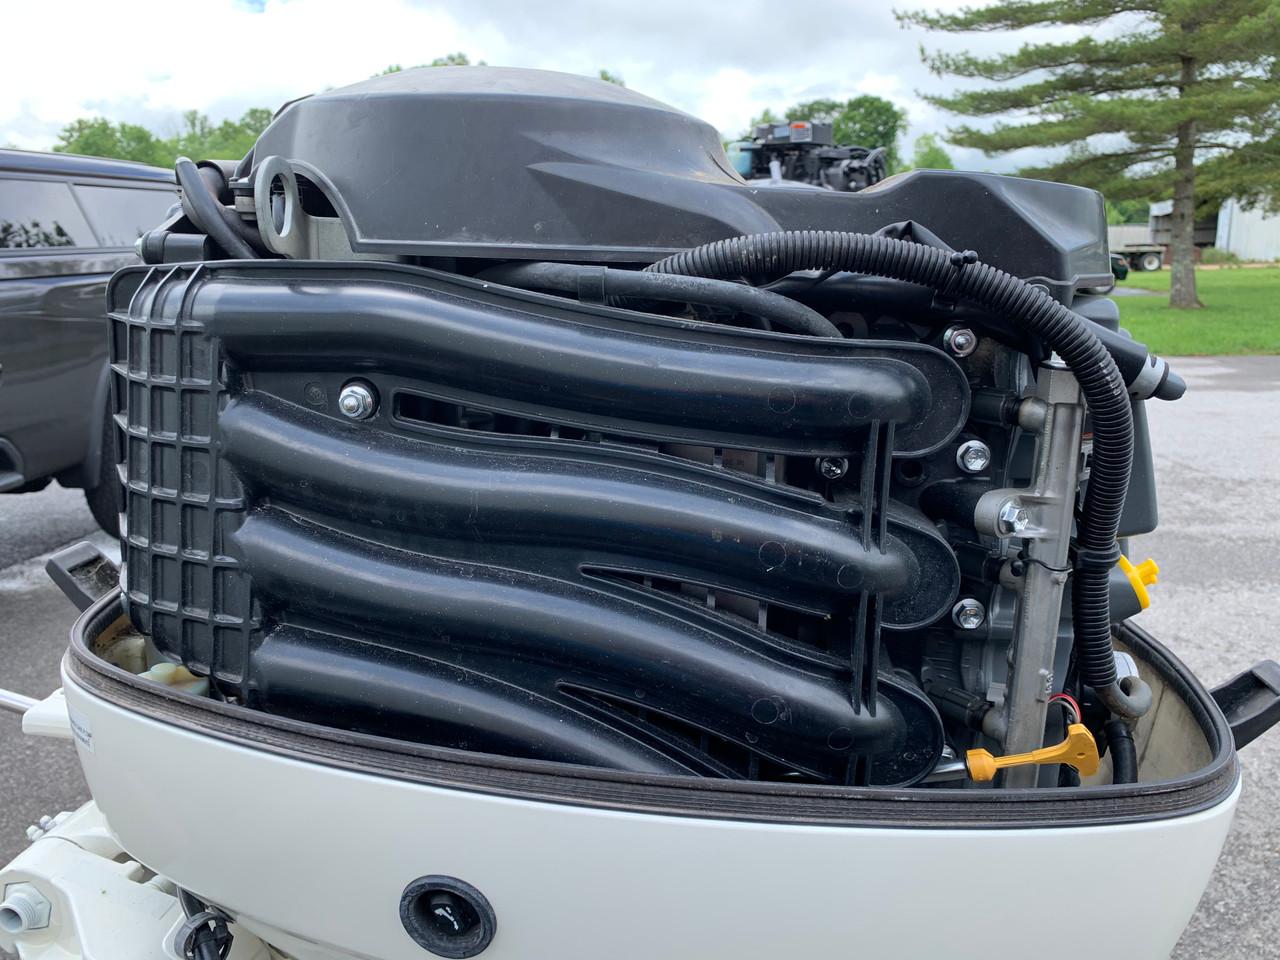 "2005 Johnson/Suzuki 60 HP 4 Cylinder EFI 4 Stroke 20"" (L) Outboard Motor"